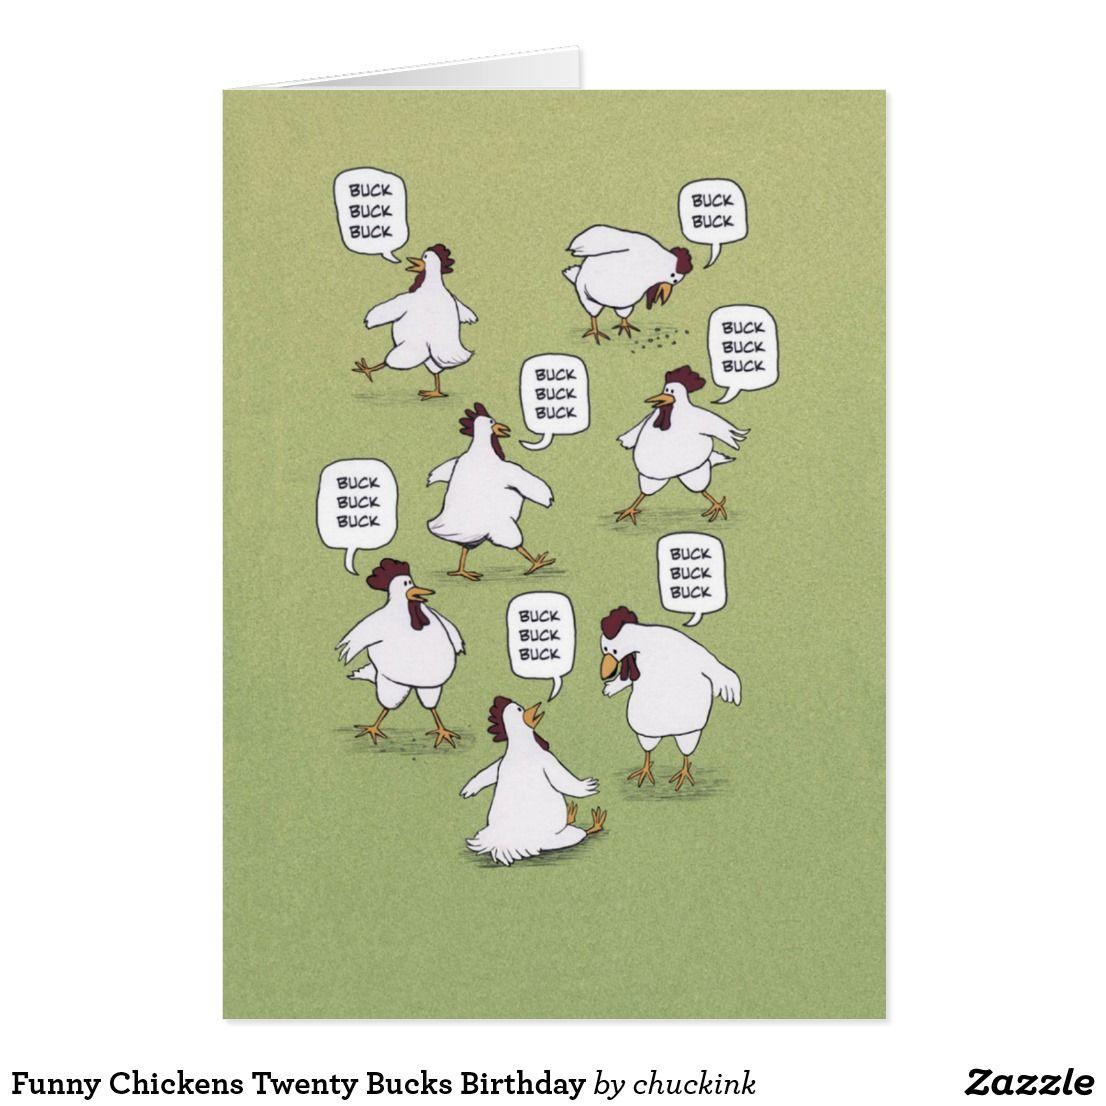 Funny chickens twenty bucks birthday card funny greeting cards funny chickens twenty bucks birthday card kristyandbryce Image collections